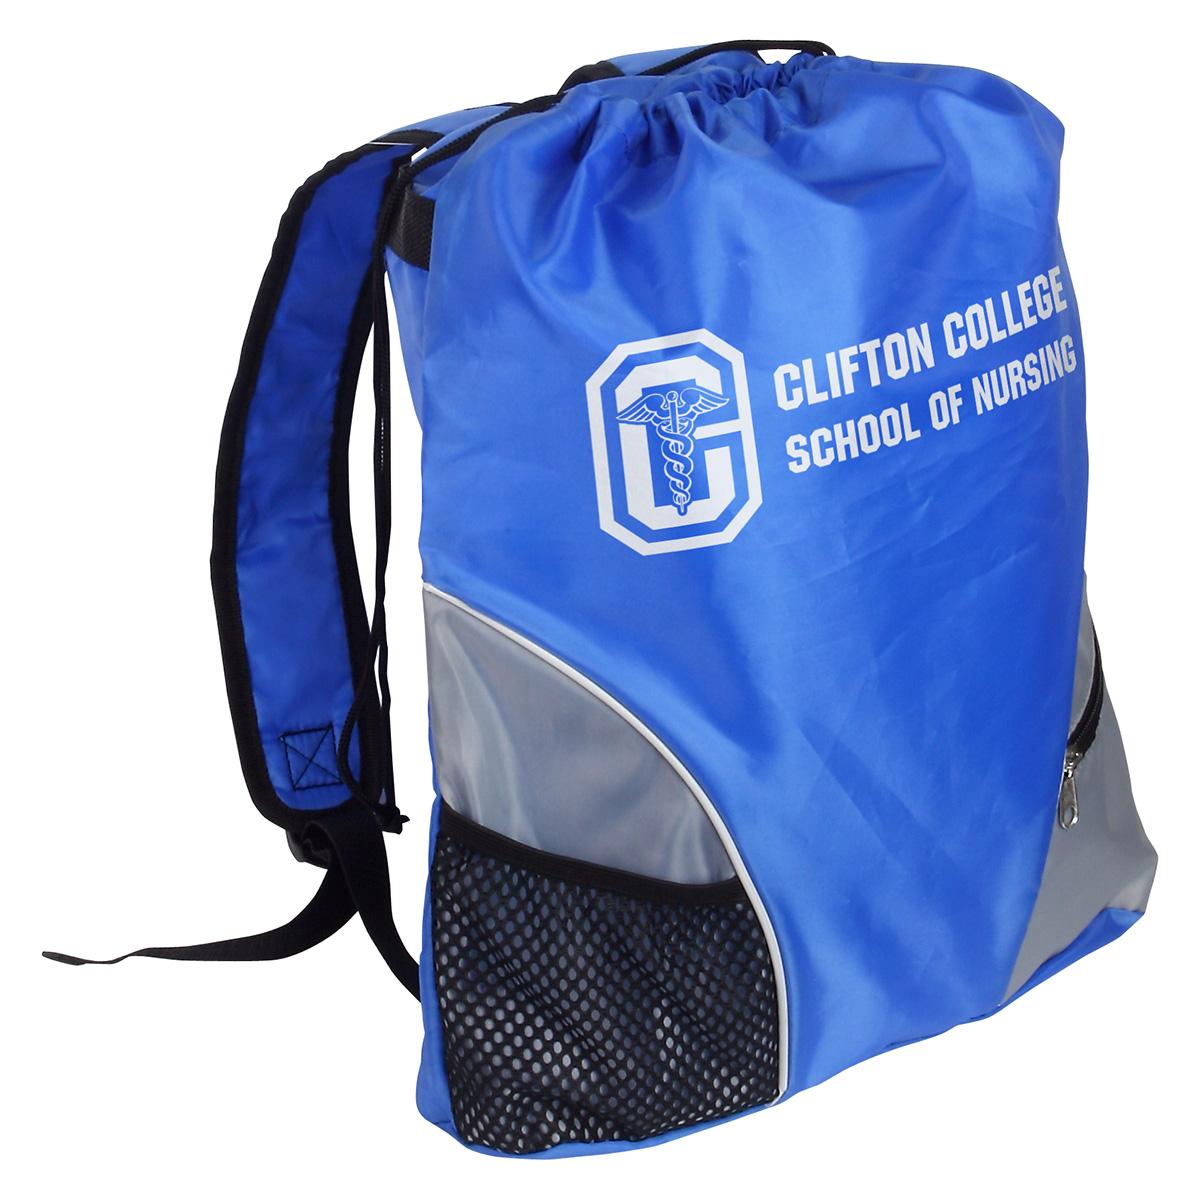 Crossroads Backpack w/ Padded Shoulder Strap, WBA-CR11 - 1 Colour Imprint